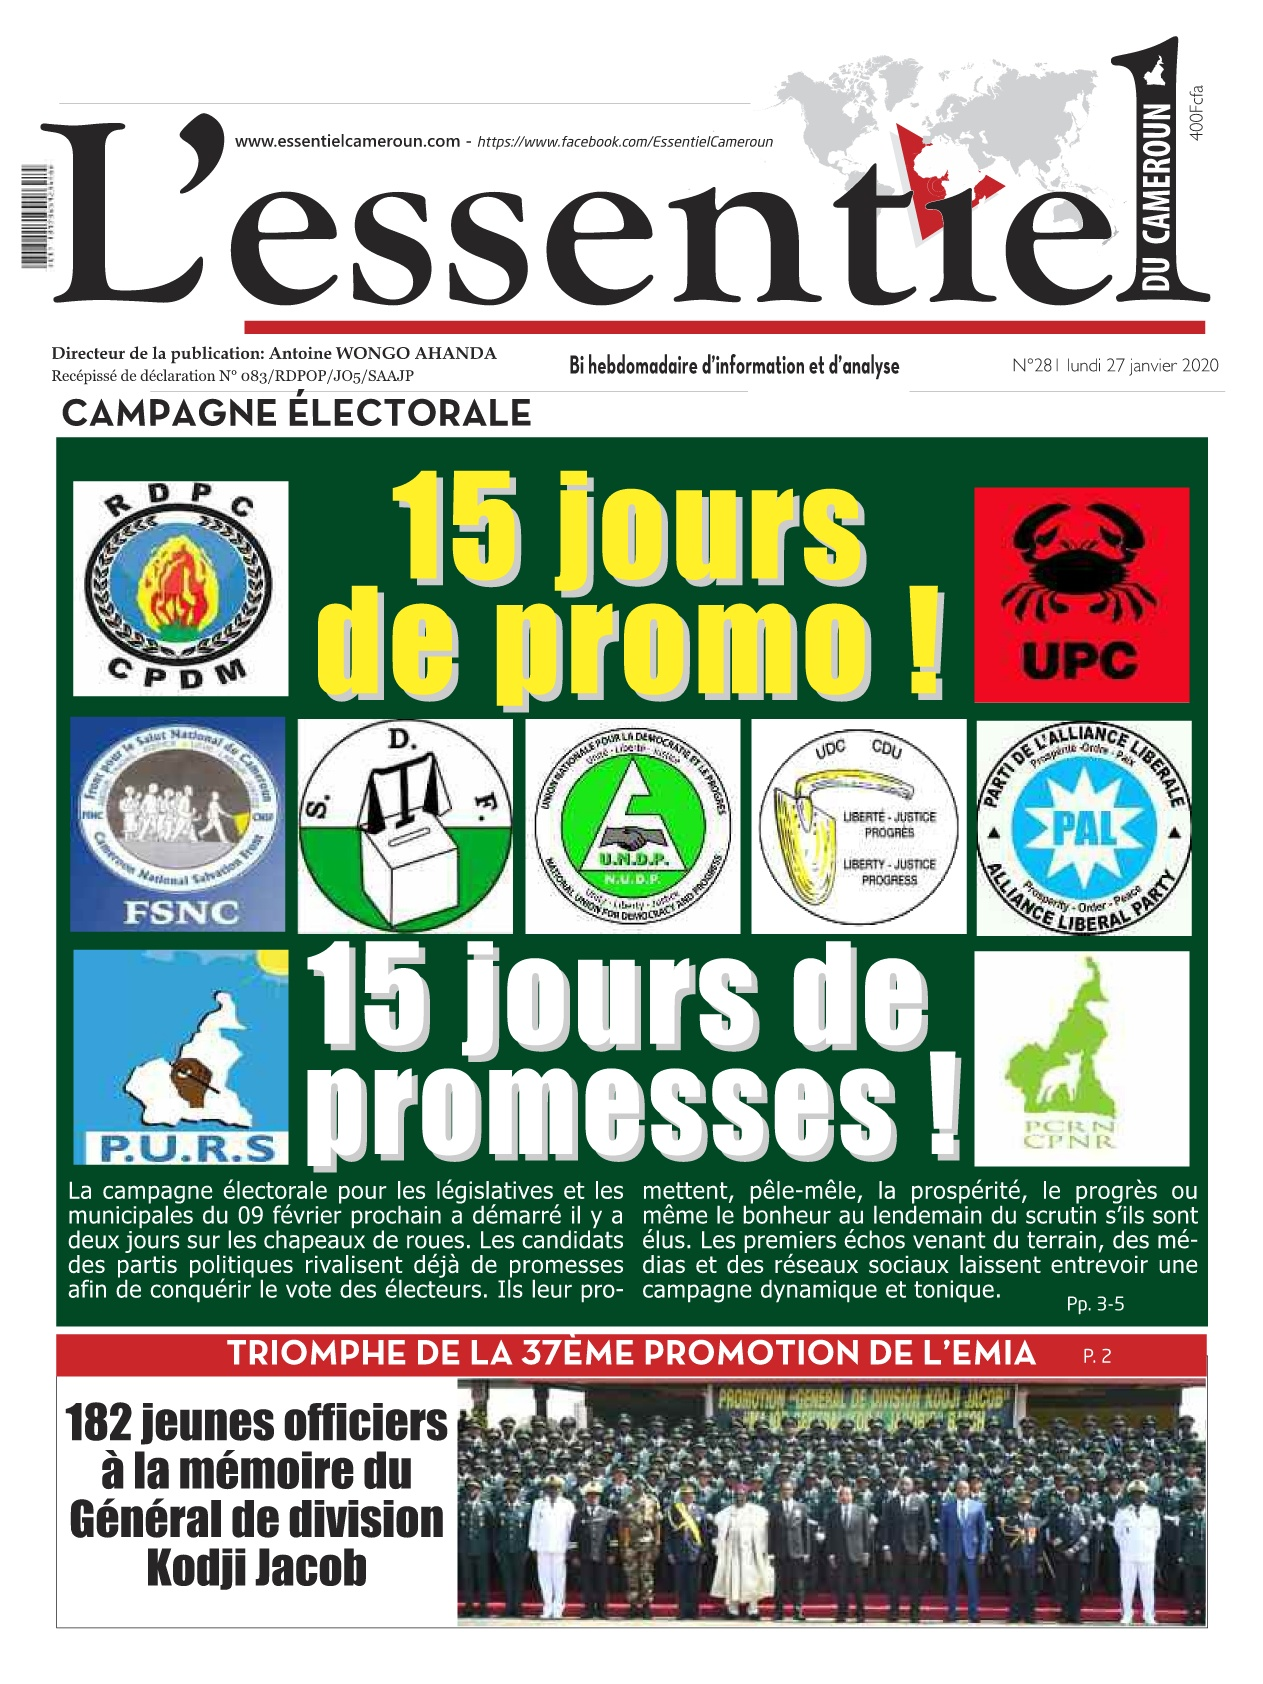 L'essentiel du Cameroun - 27/01/2020